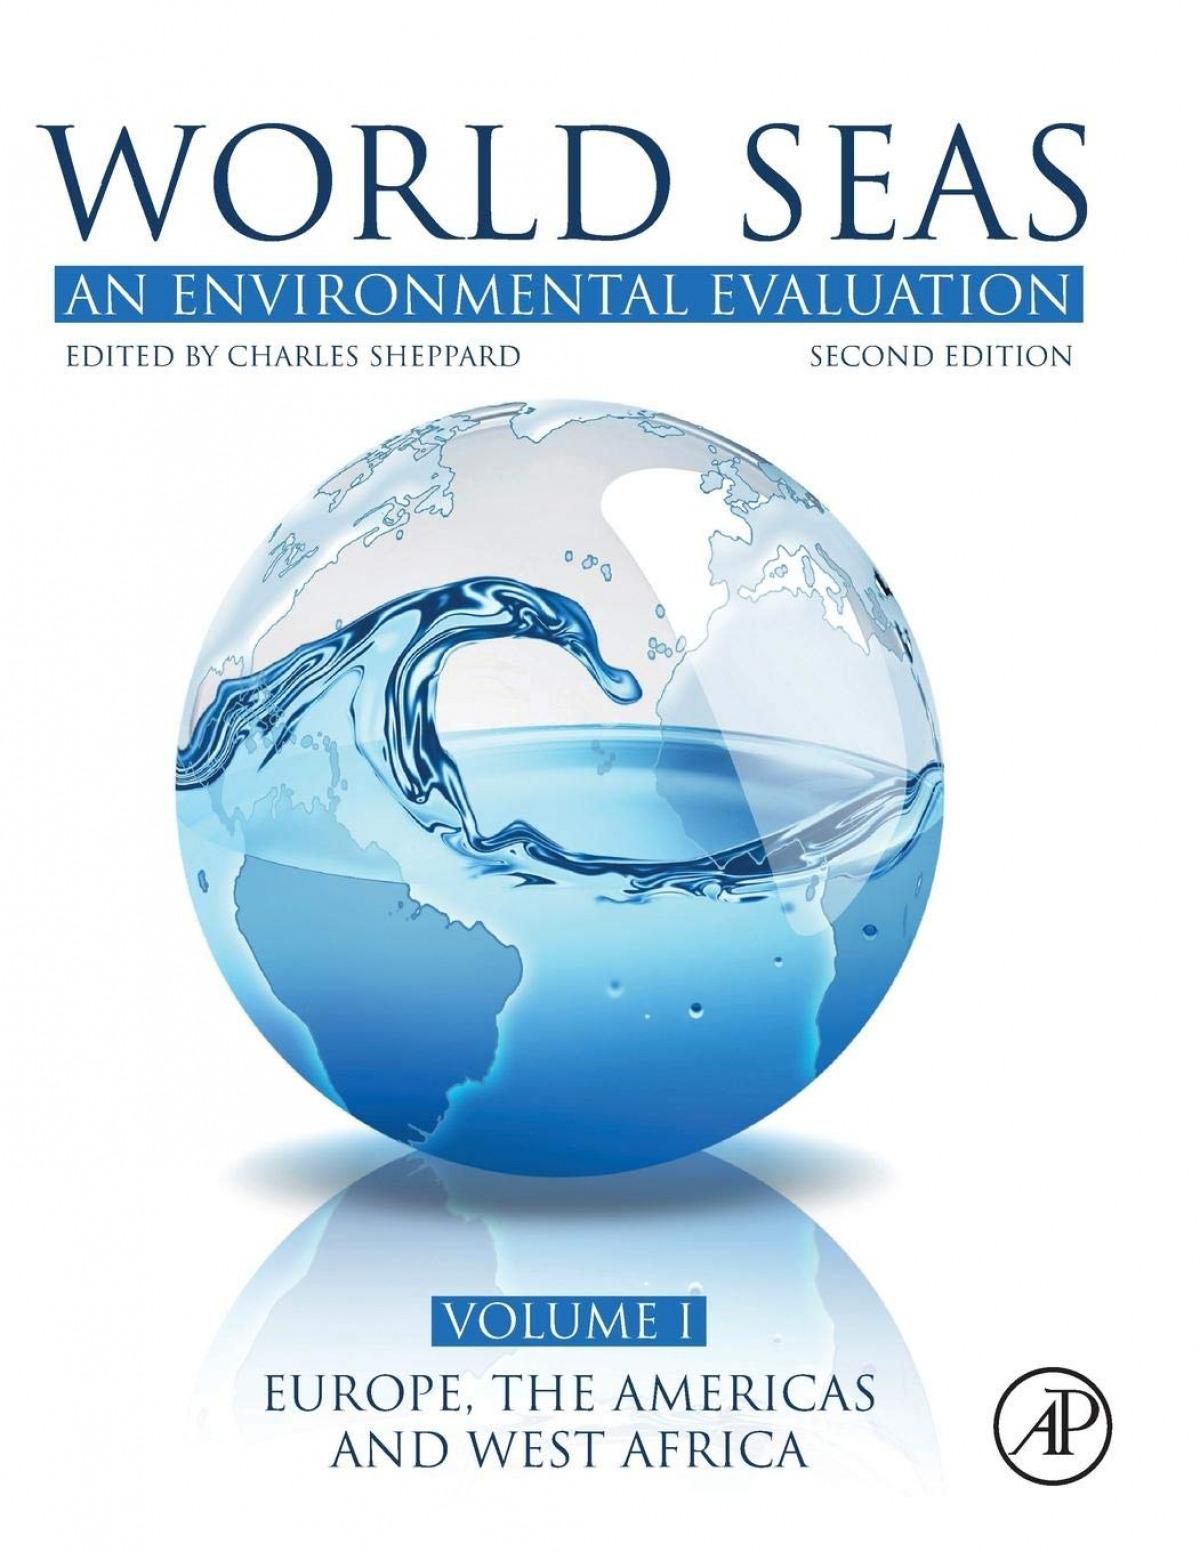 WORLD SEAS. VOLUME I